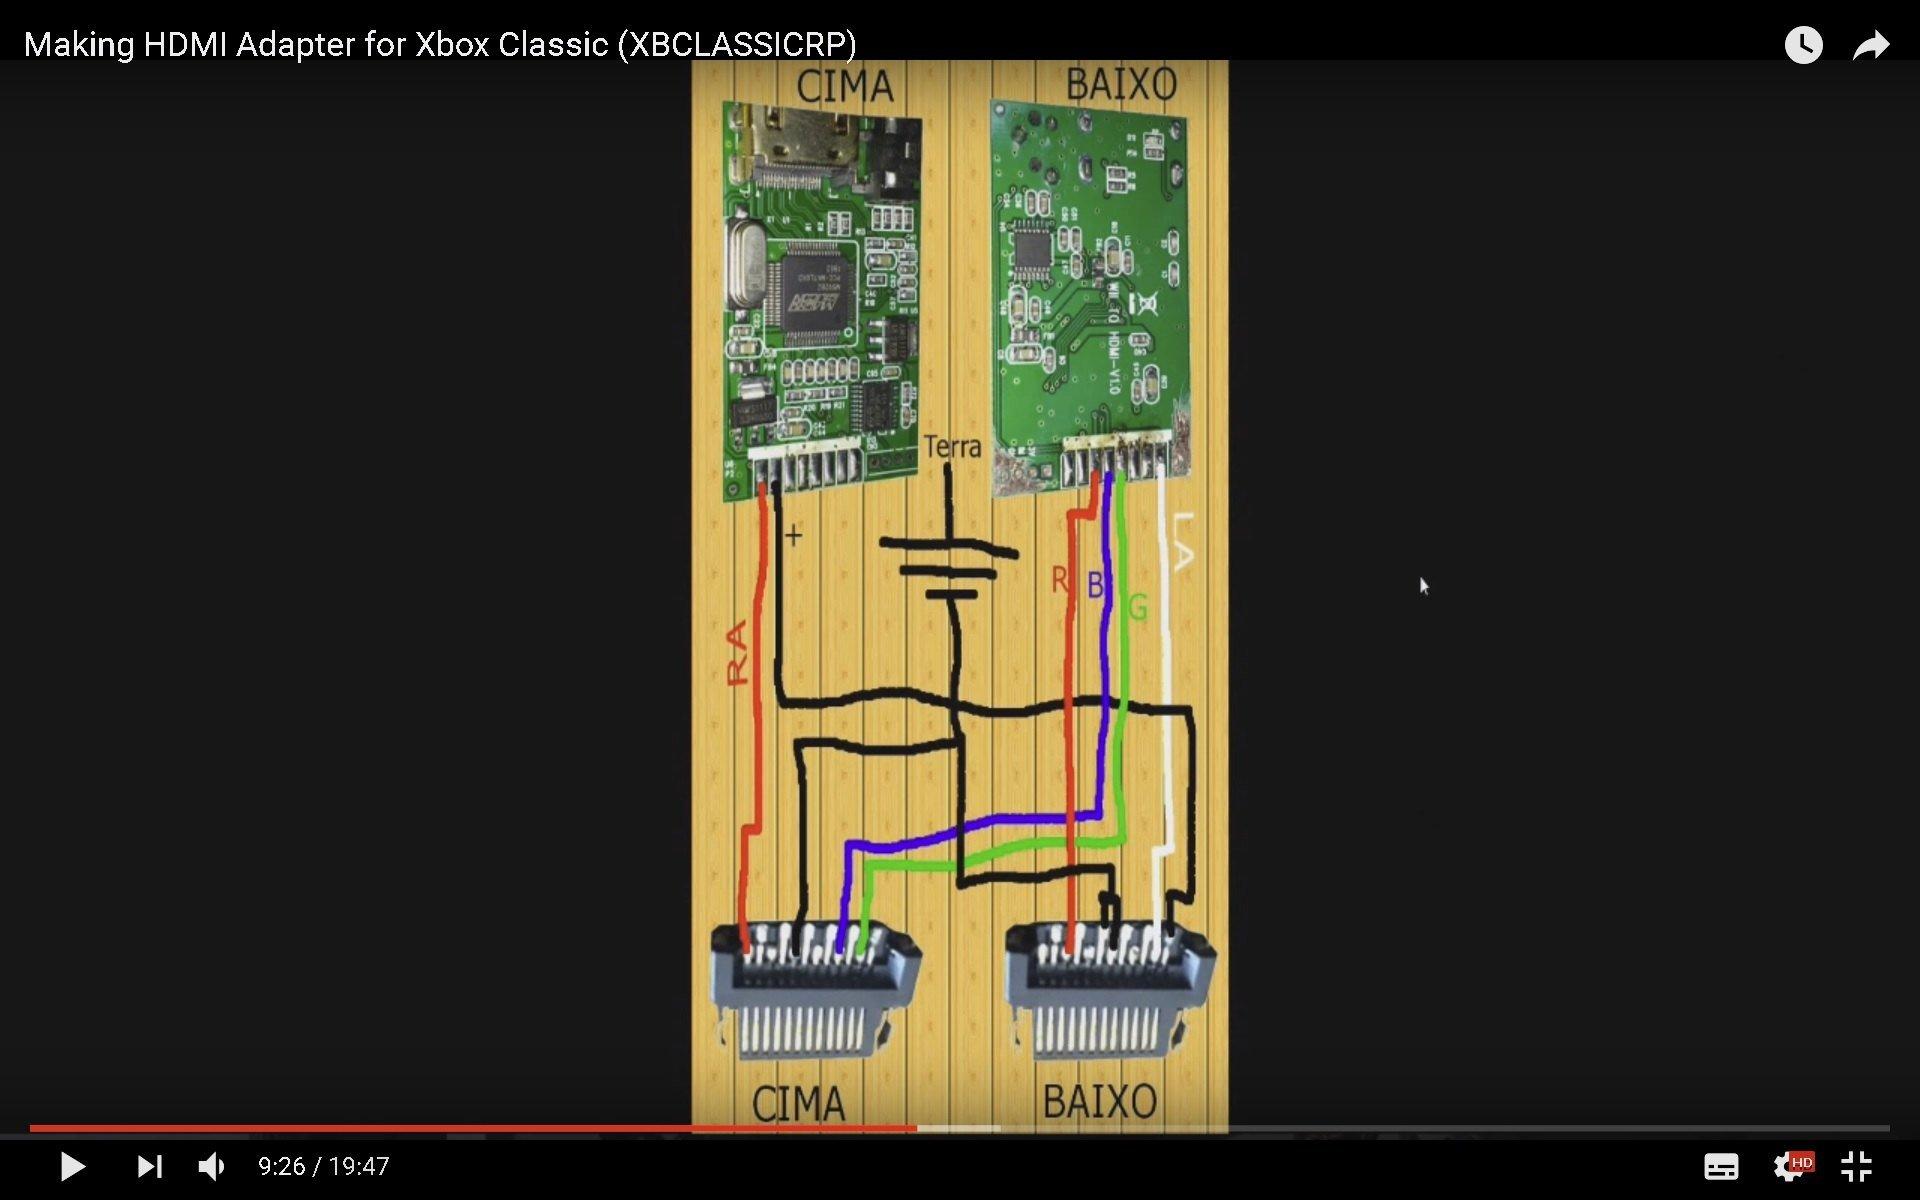 cheap xbox hdmi mod | GBAtemp.net - The Independent Video ... on